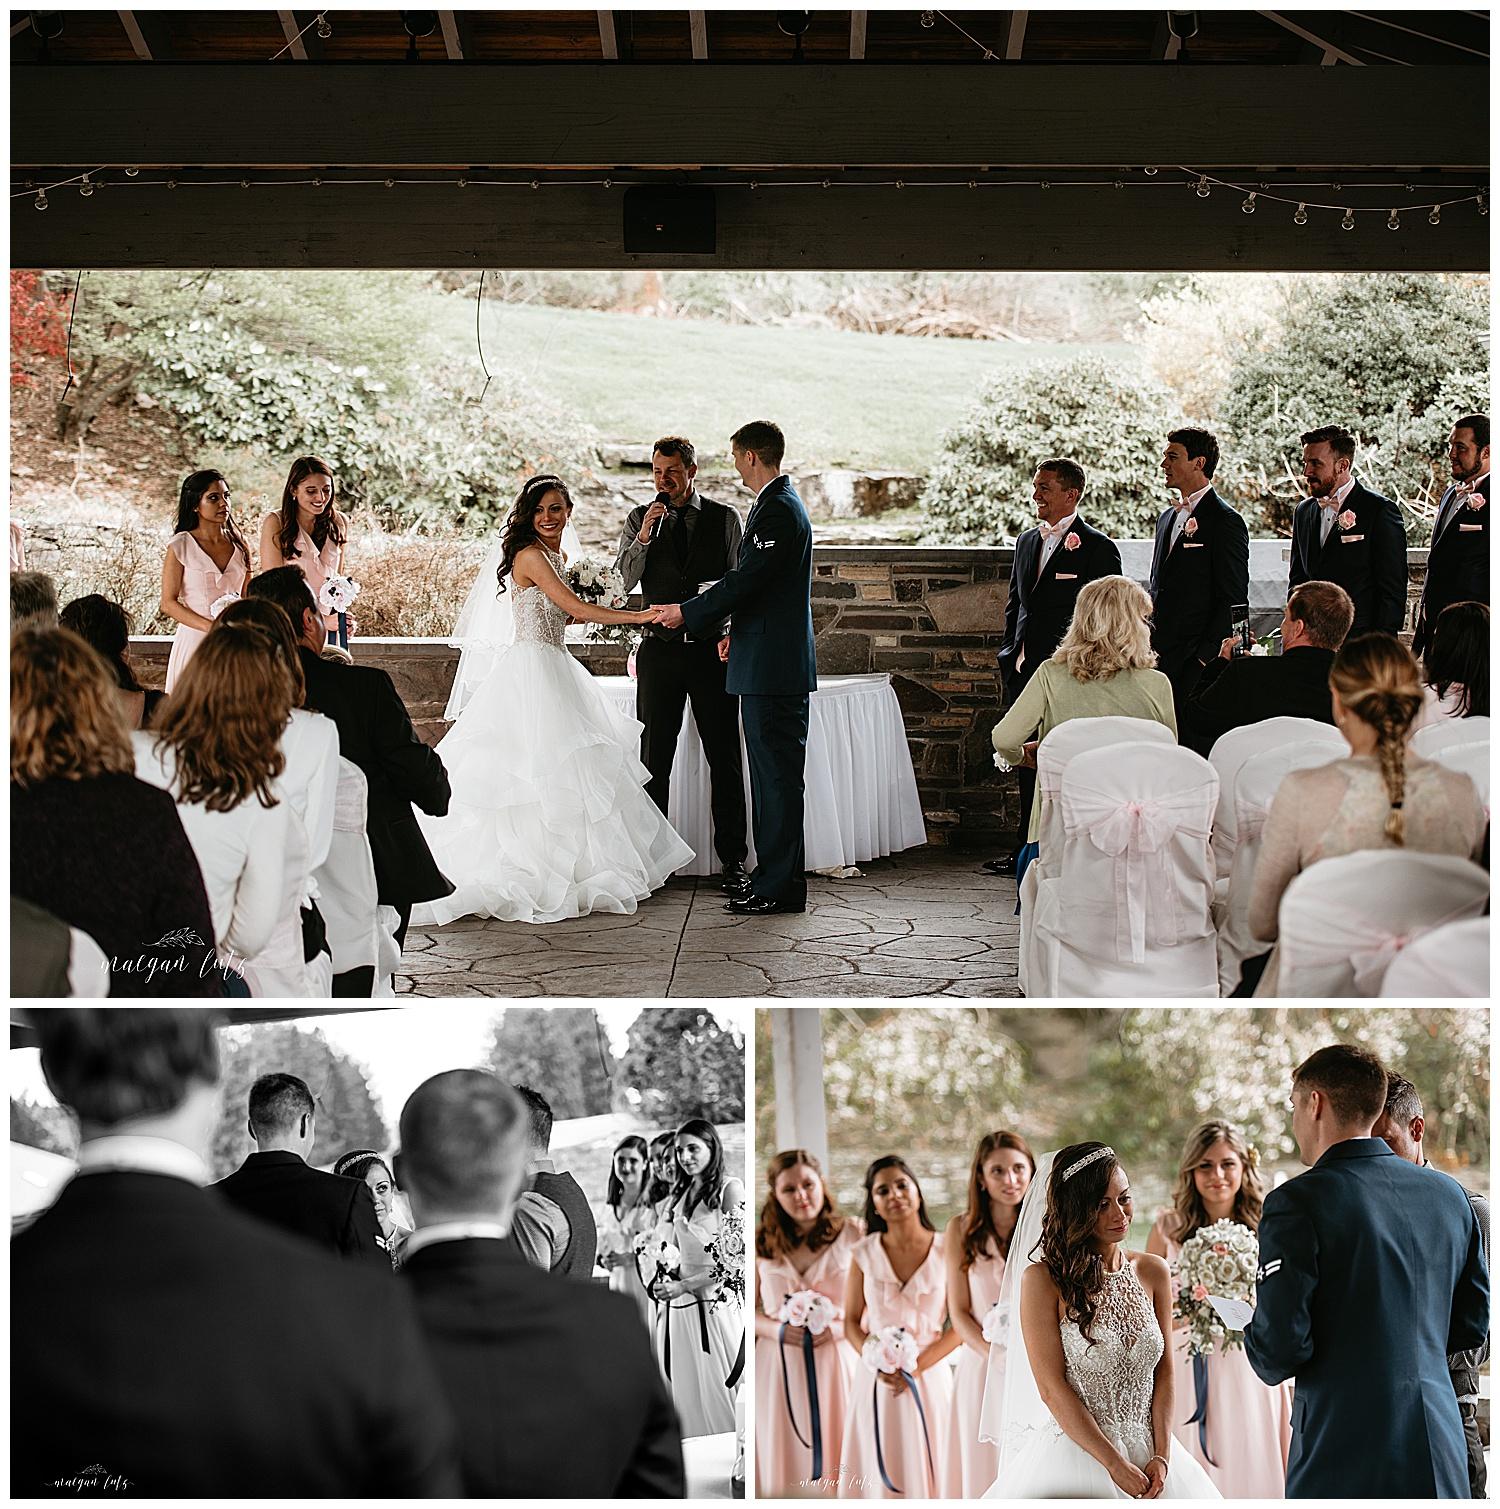 NEPA-Lehigh-Valley-Wedding-Photographer-at-Glen-Oak-Country-Club-Clarks-Summit-PA_0042.jpg